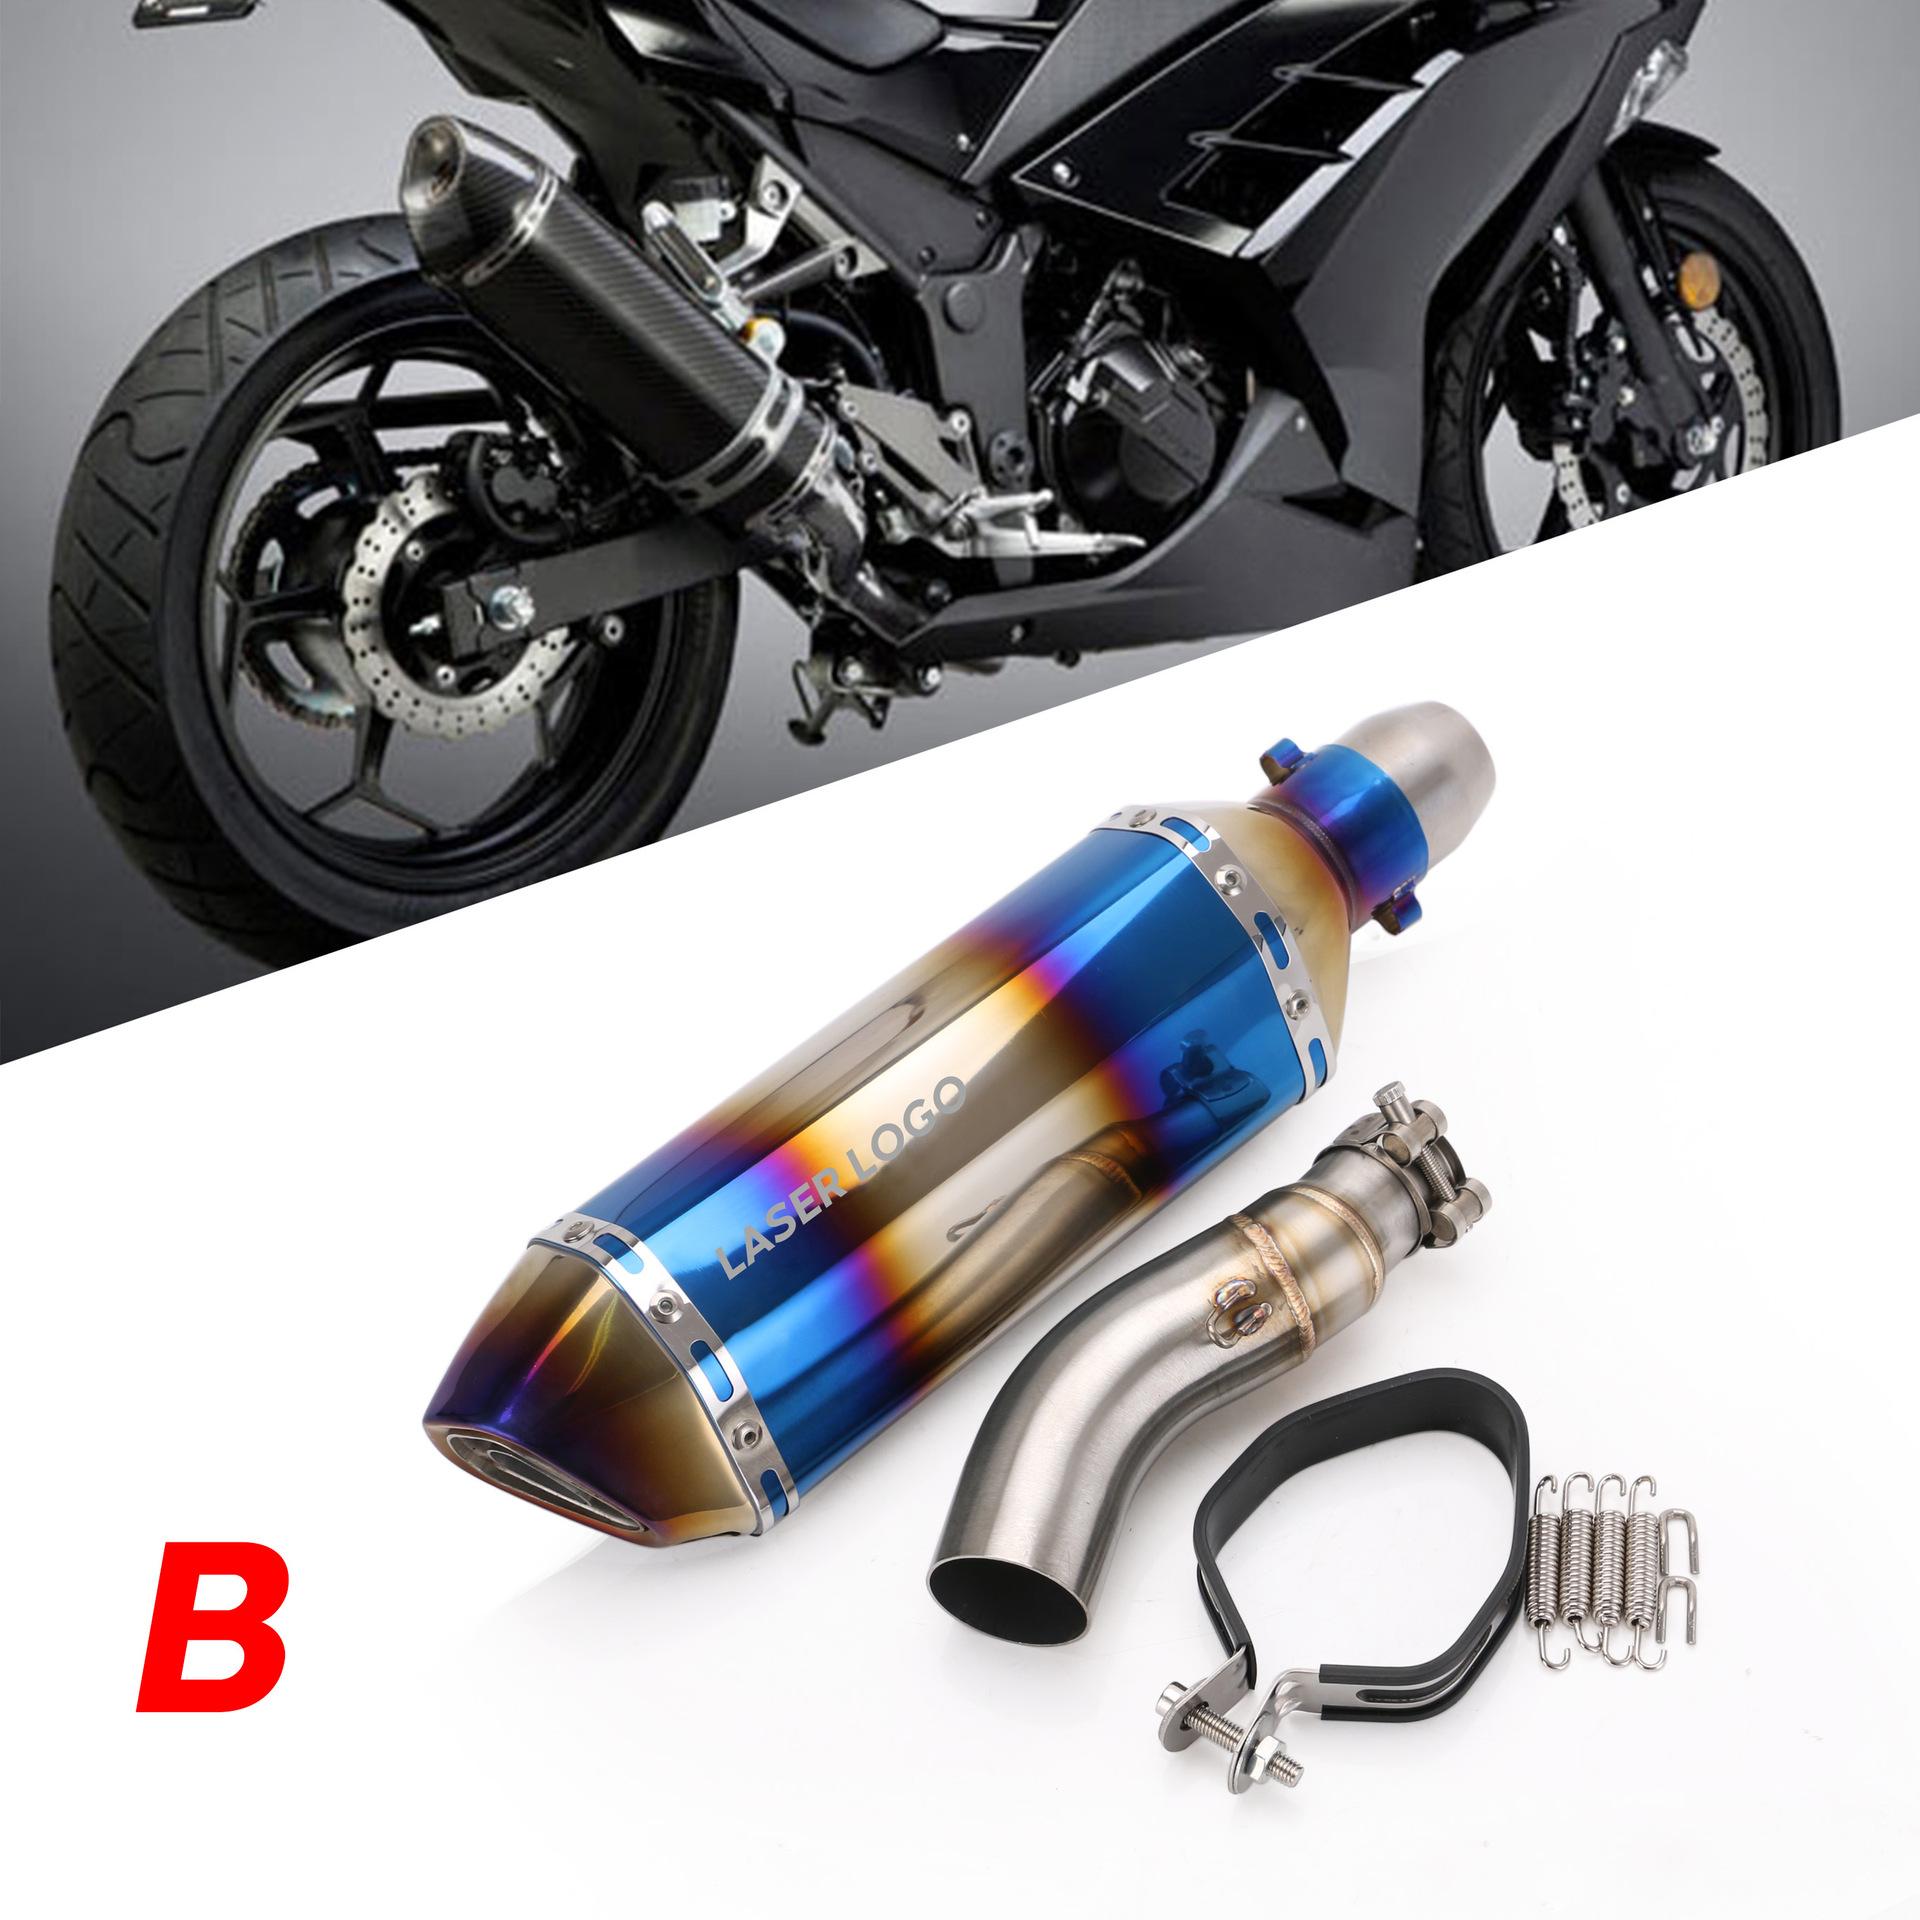 Motorcycle Exhaust Pipe Stainless Steel 41/37mm Exhaust Pipe For Kawasaki Ninja 300 13-15 B